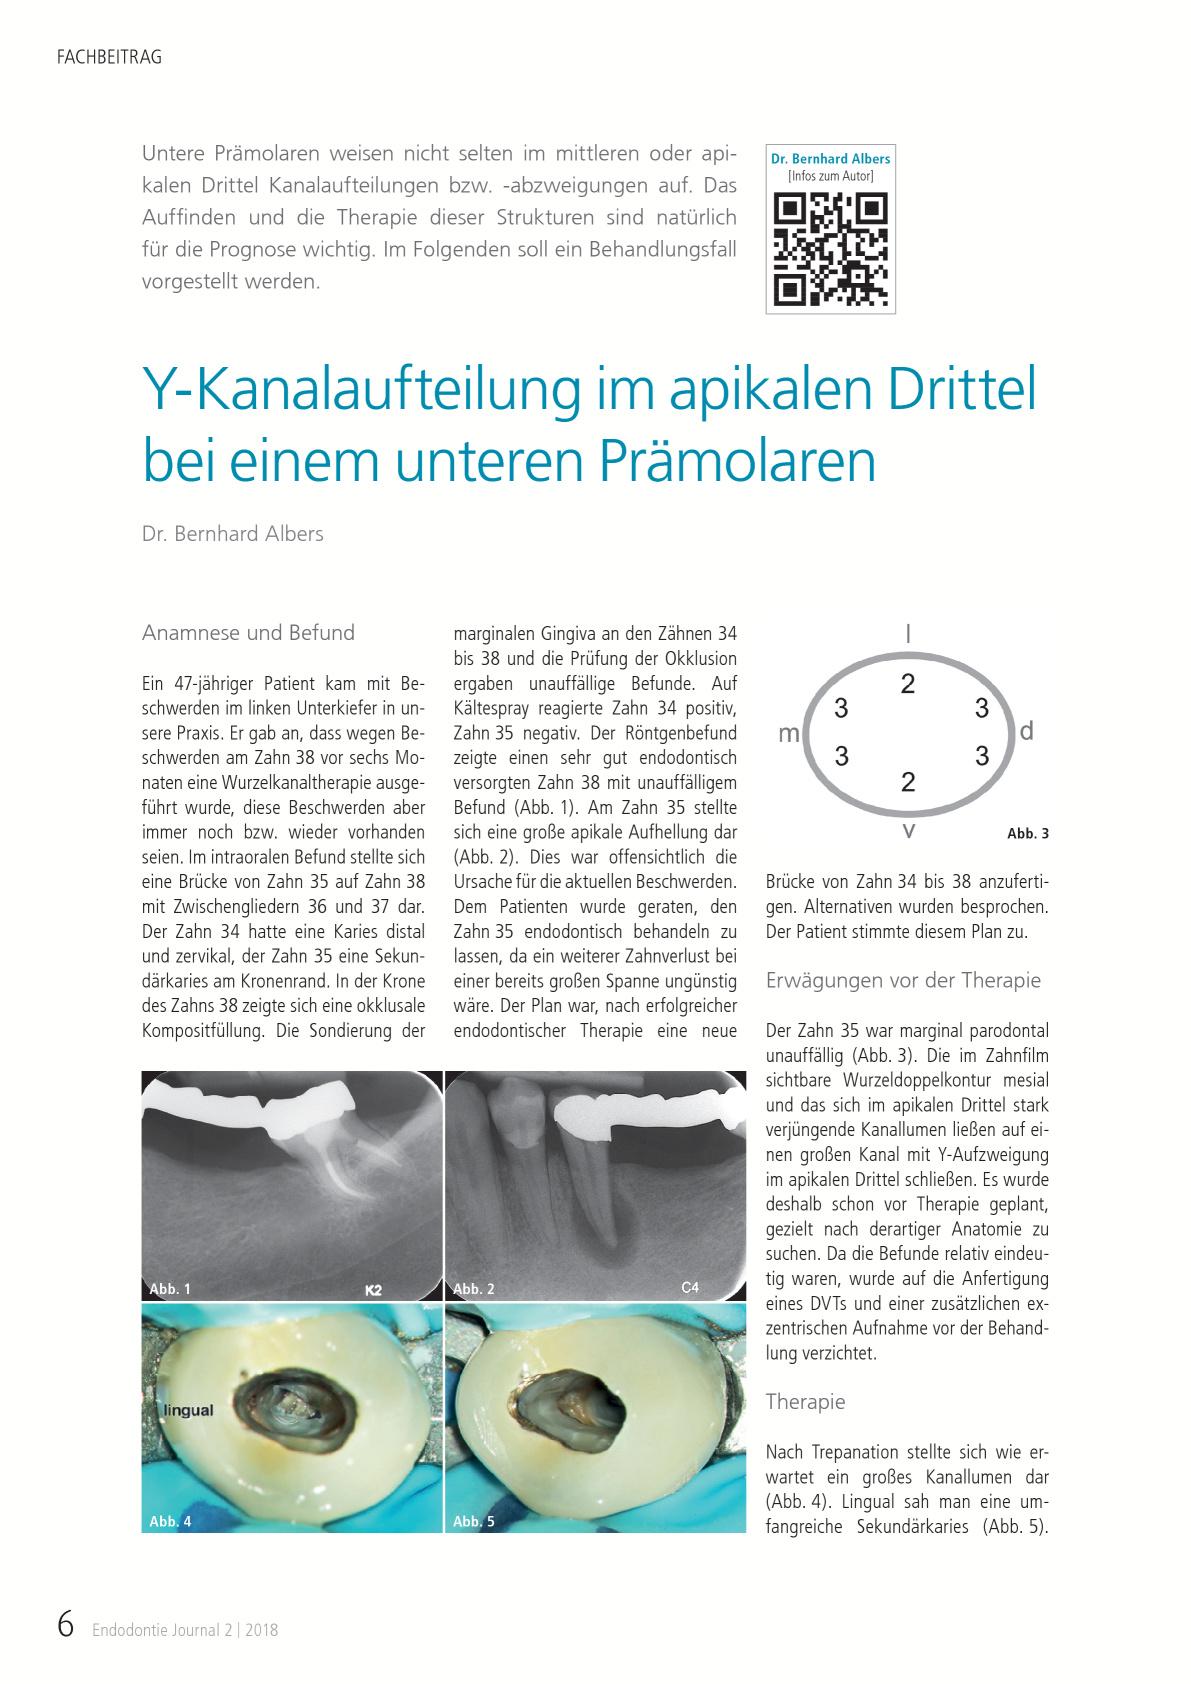 Großzügig Anatomie Der Brücke Ideen - Anatomie Ideen - finotti.info